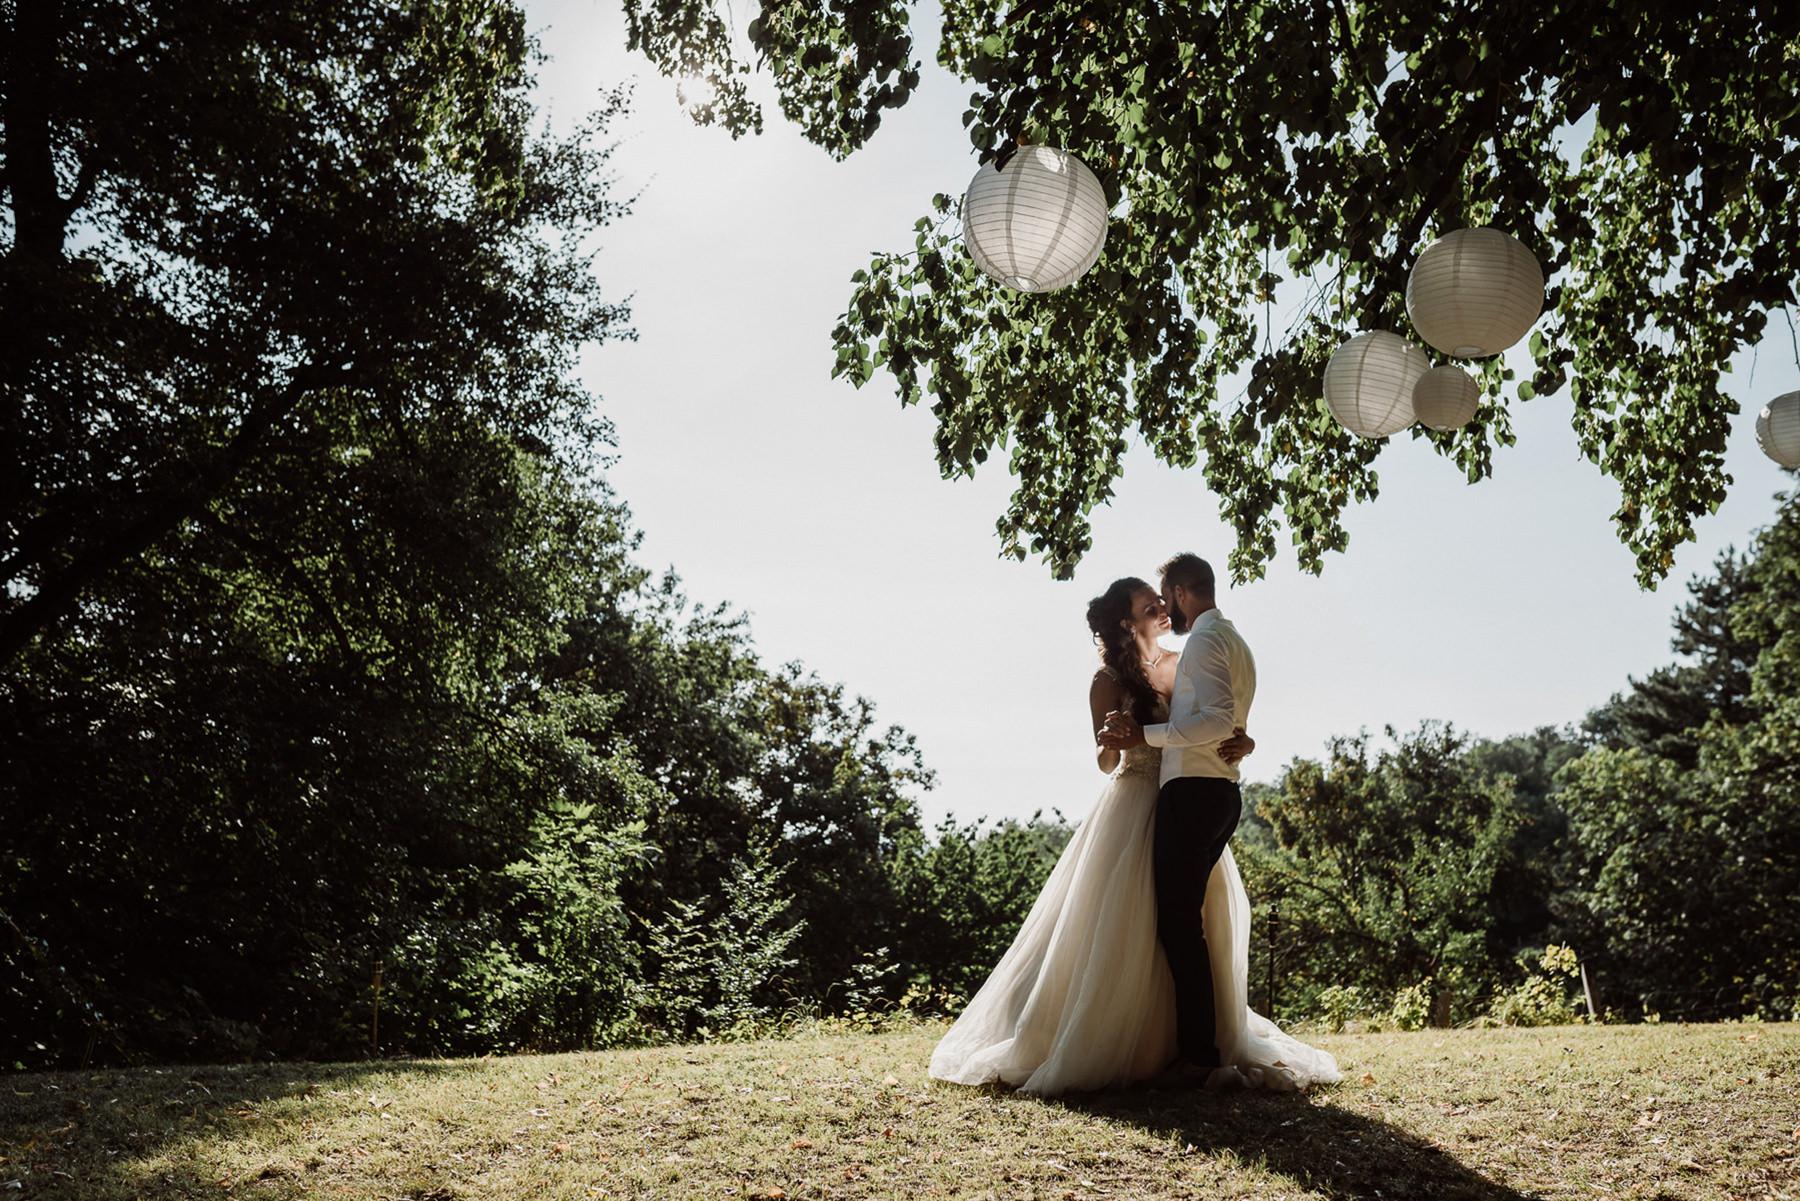 Zomerbruiloft   Buiten trouwen   Trouwfotoshoot